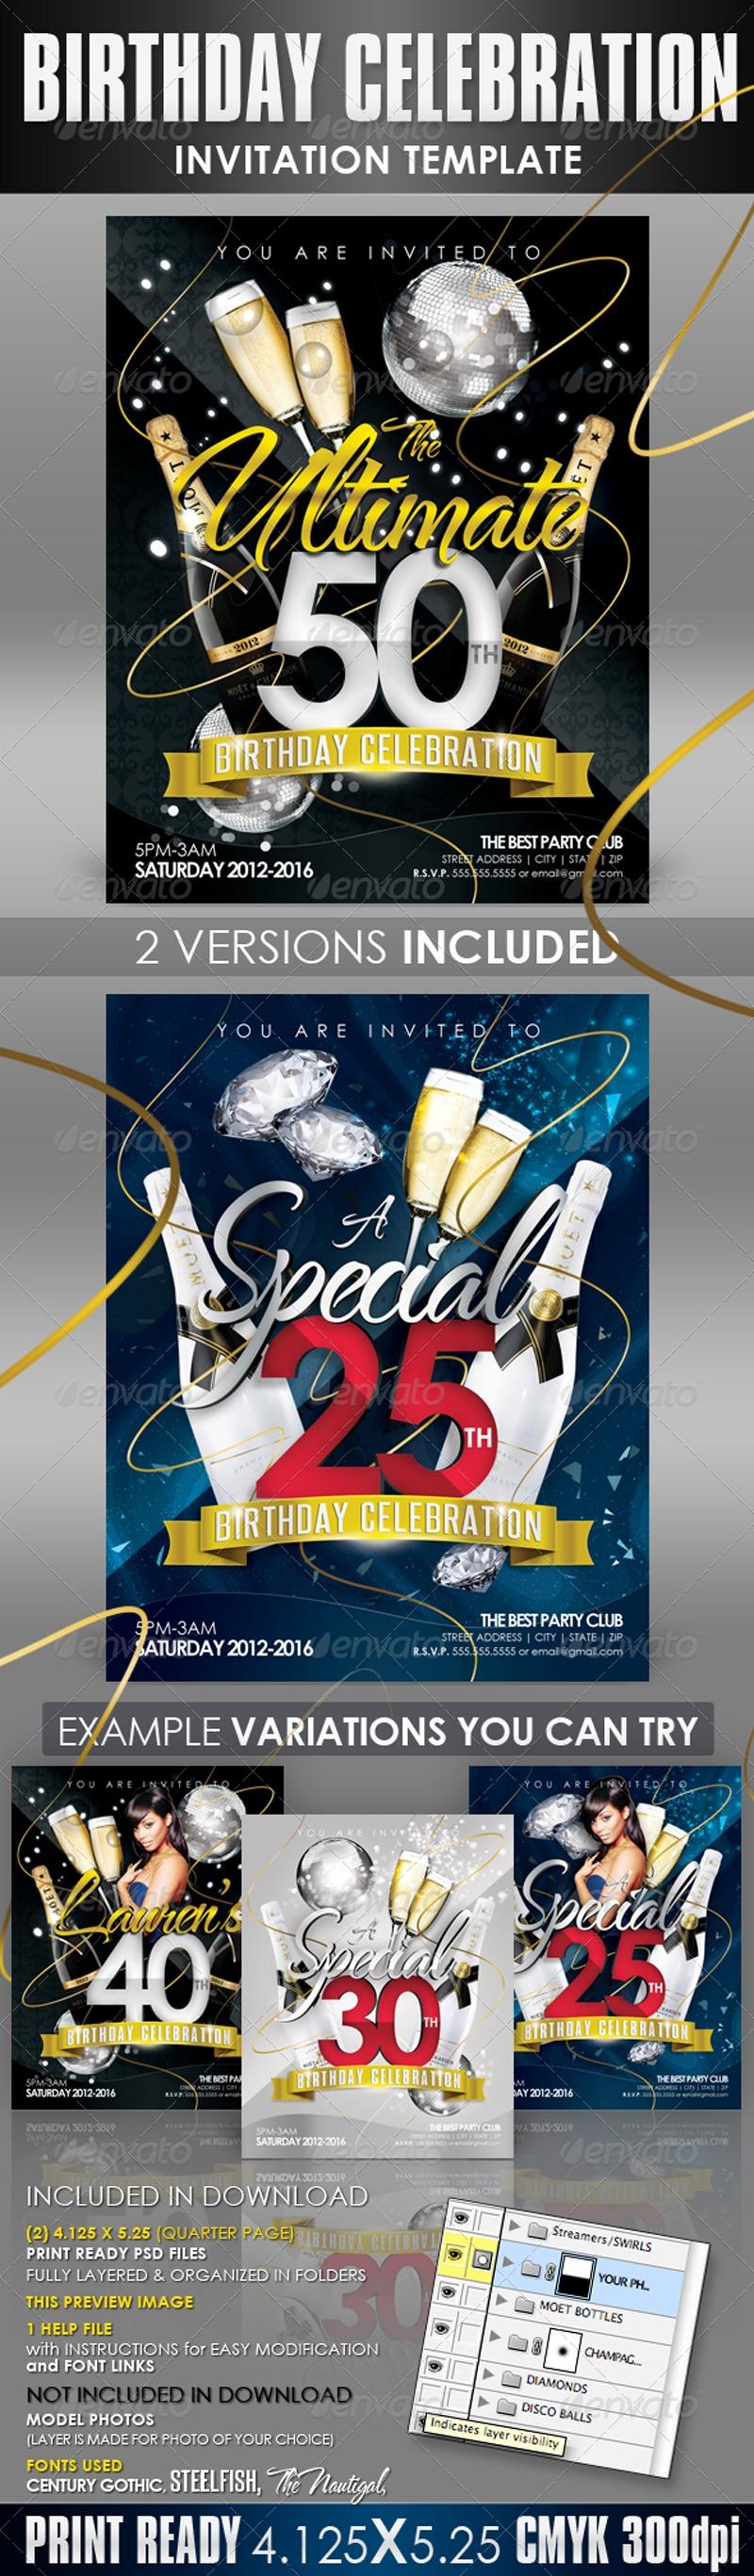 Christmas-Party-Invitation-PSD-5